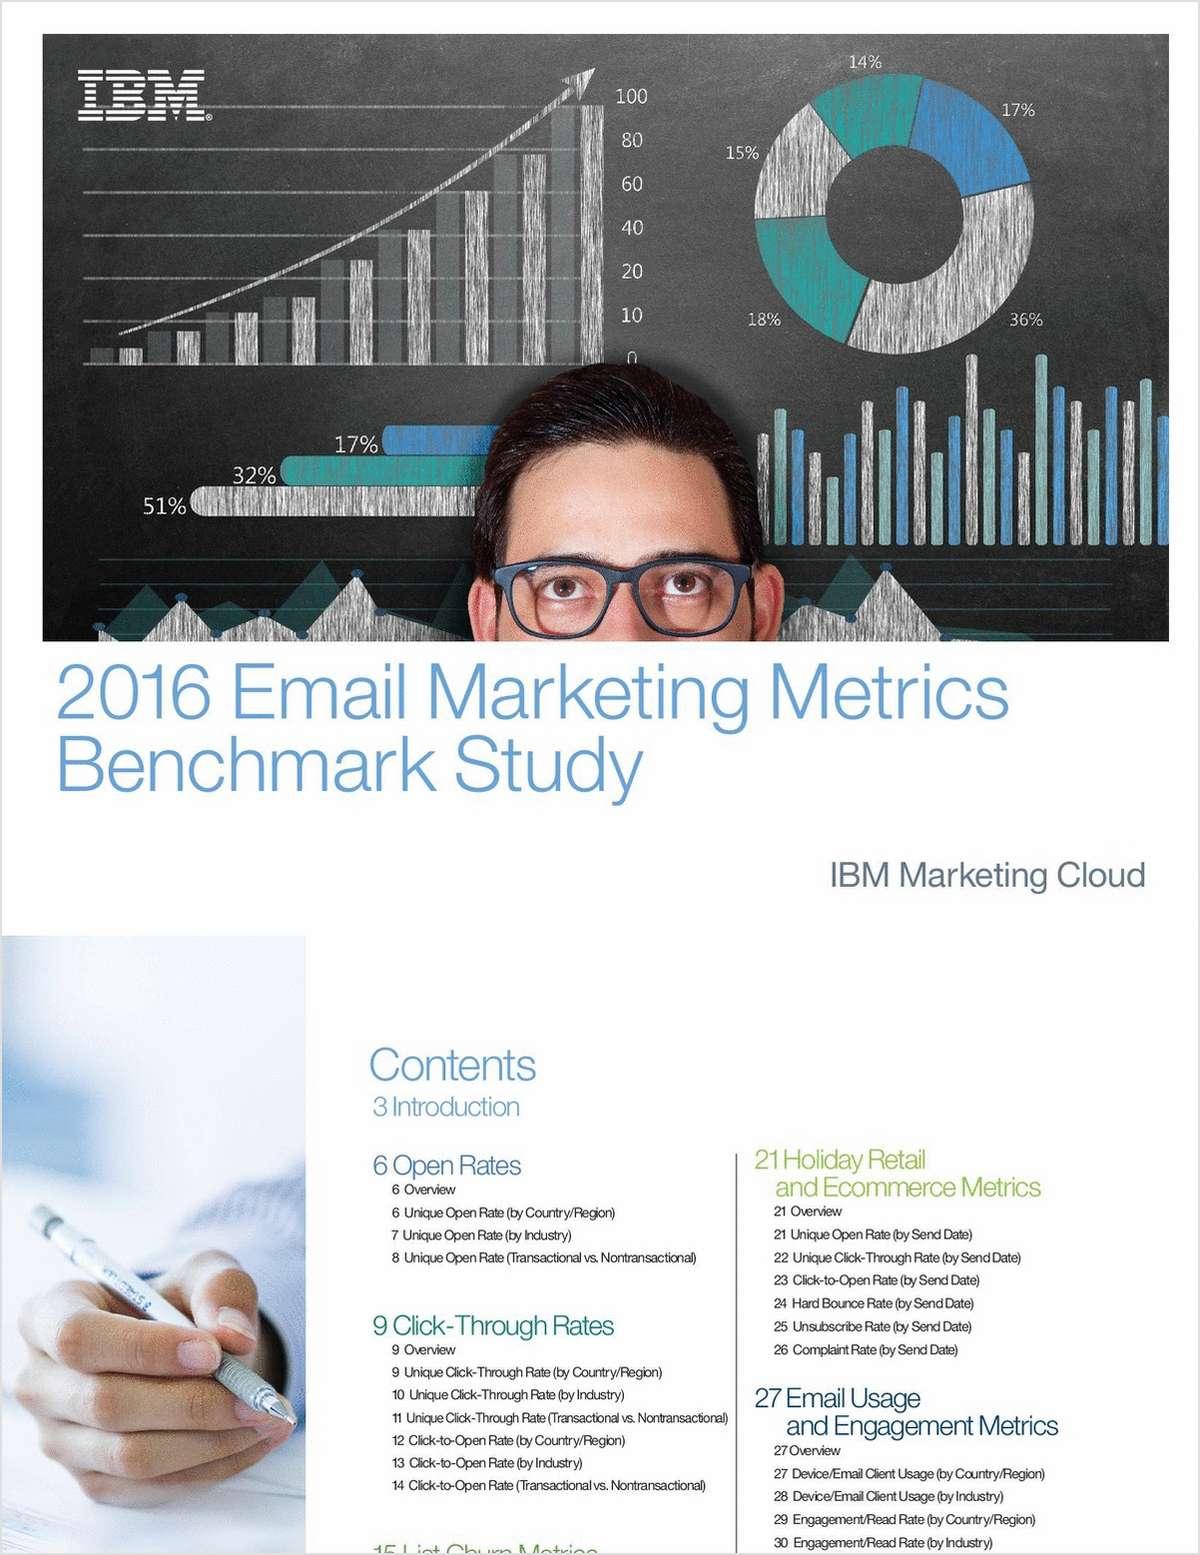 2016 Email Marketing Metrics Benchmark Study